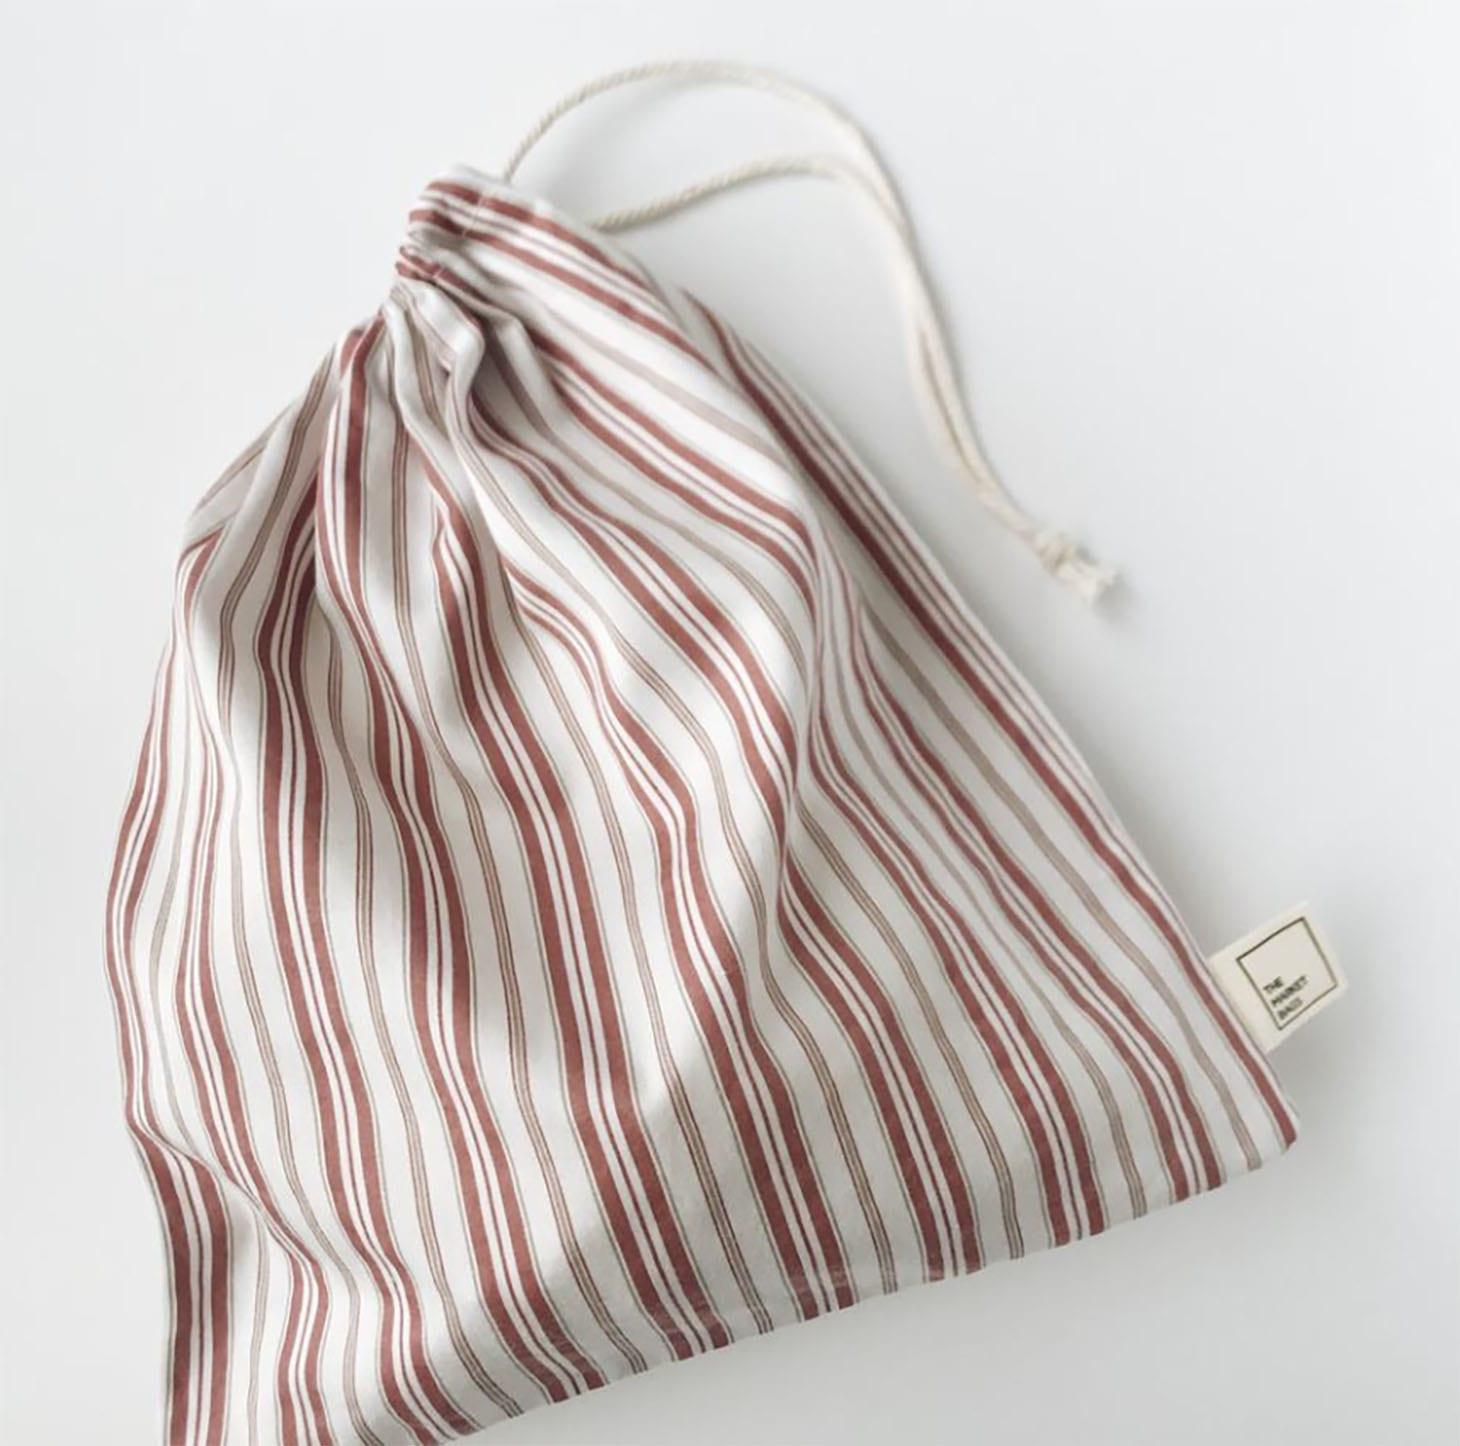 Jillian Harris Eco Friendly Wrapping